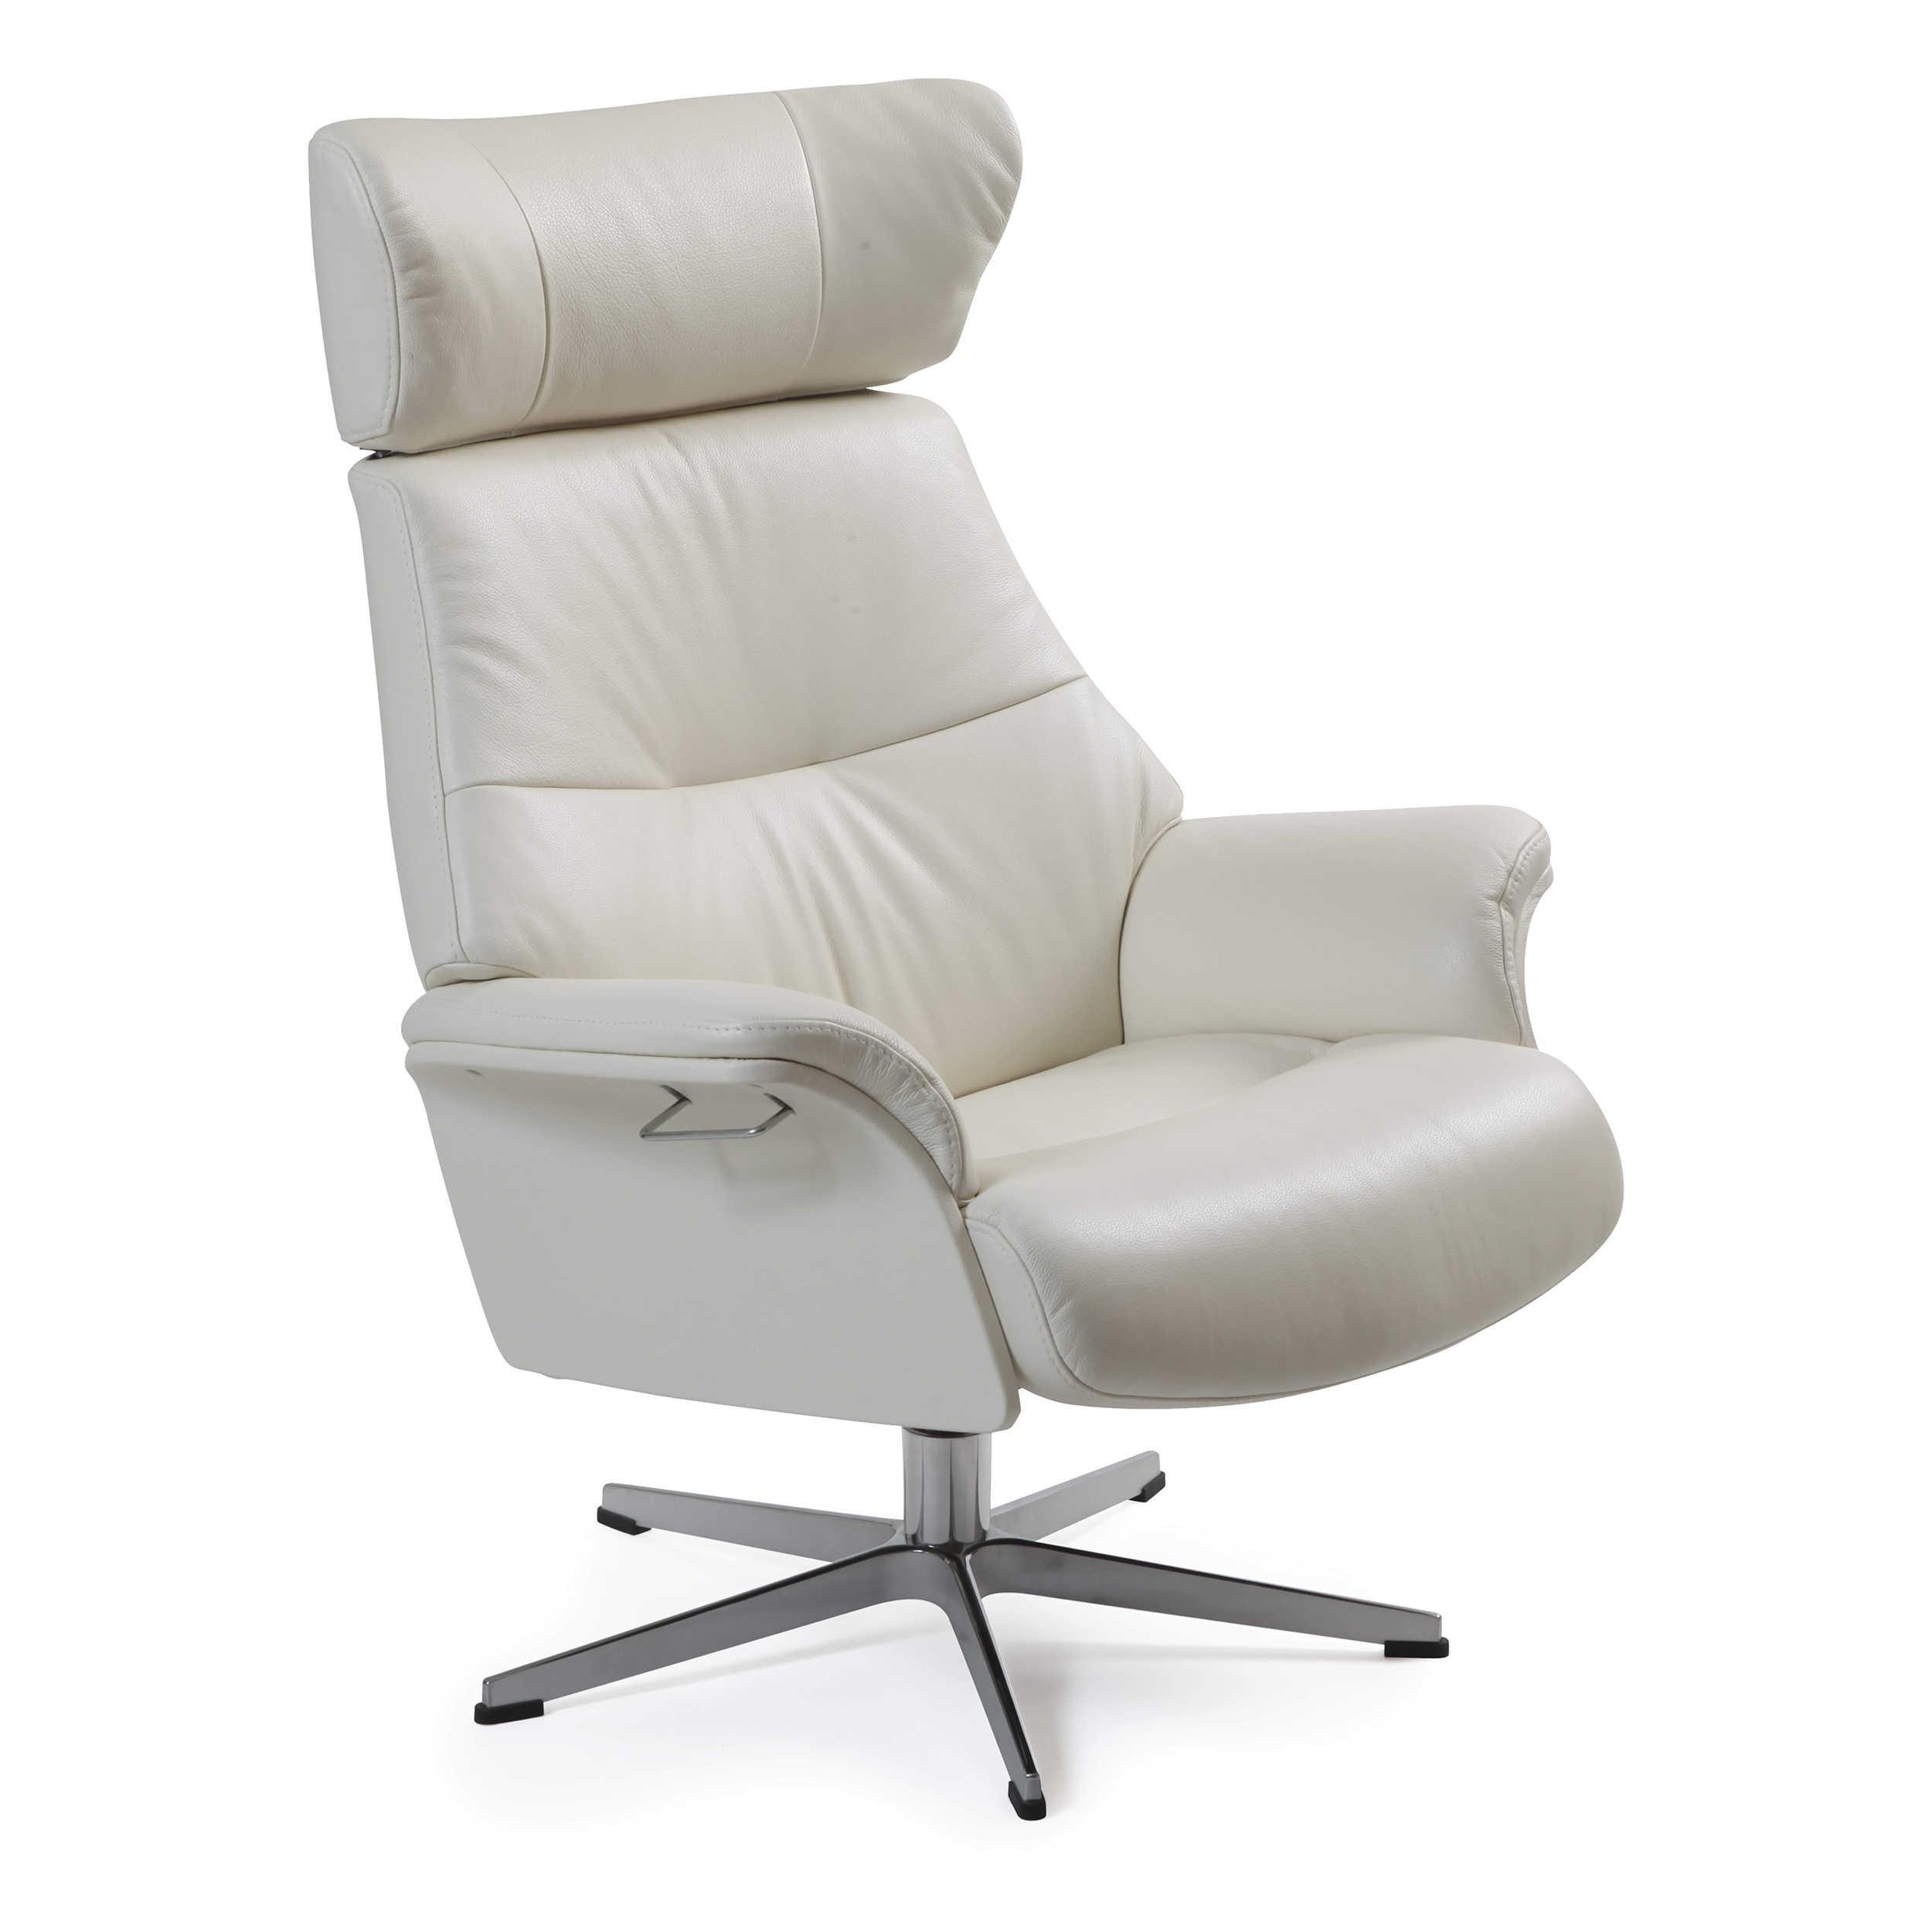 conform sessel air wei leder online kaufen bei woonio. Black Bedroom Furniture Sets. Home Design Ideas